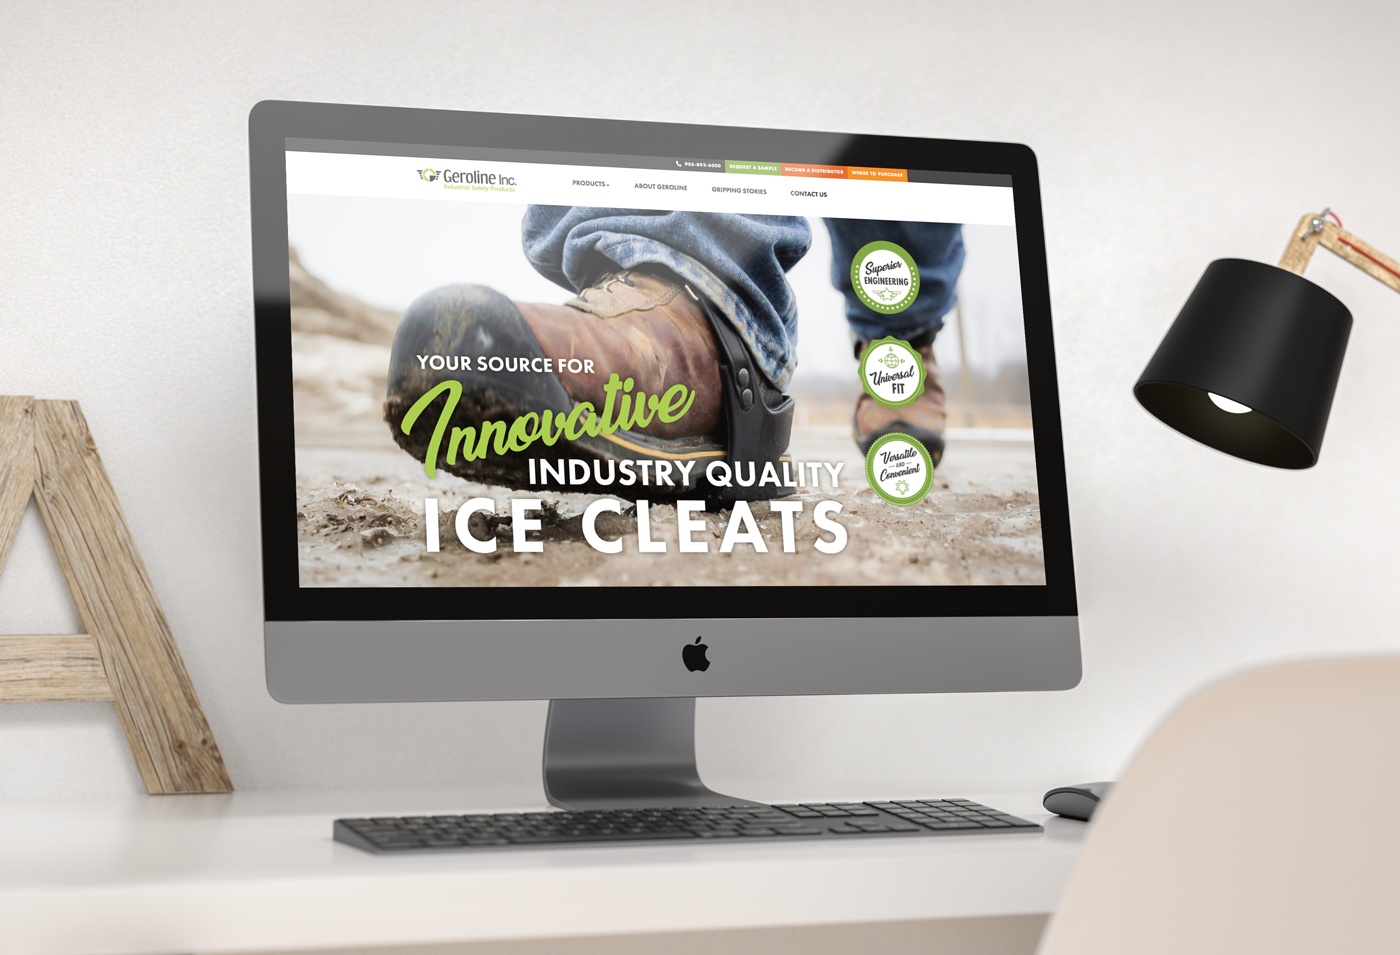 geroline homepage website design